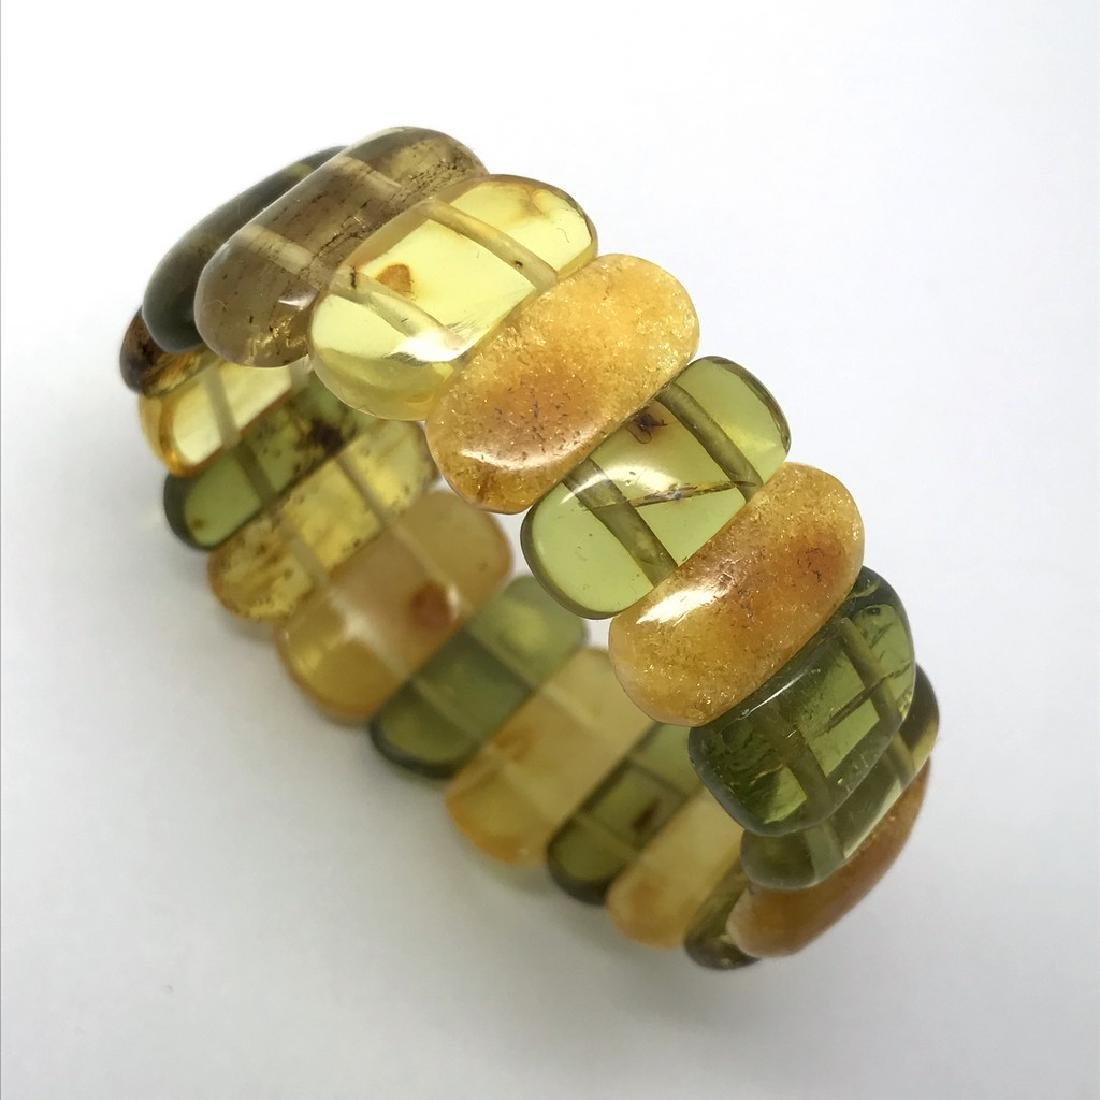 Vintage Bracelet Baltic amber cut cabochons, 19.7 grams - 2